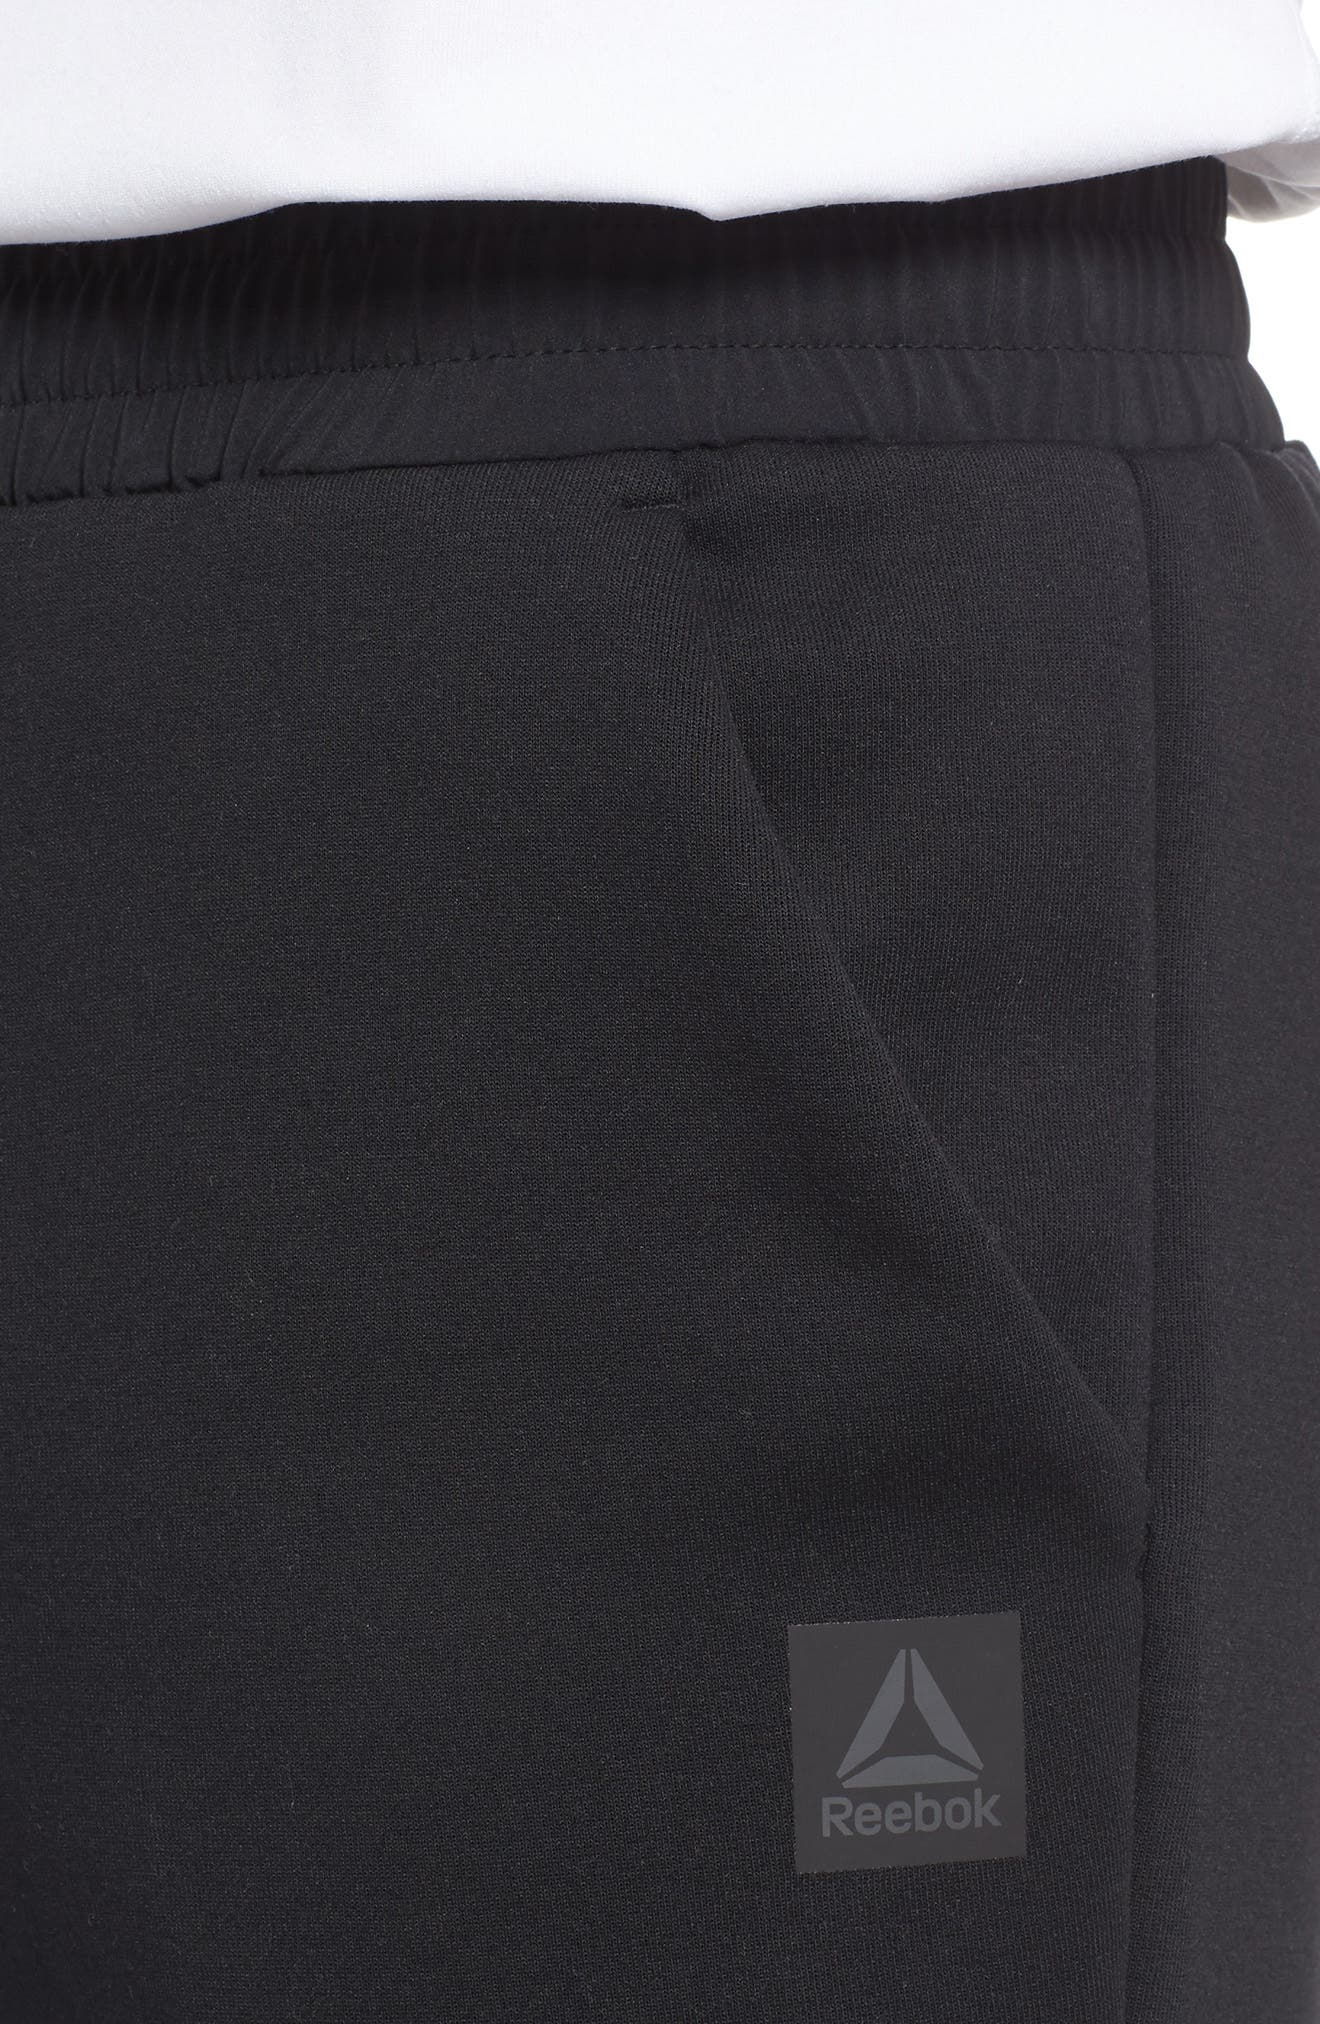 TS Knit Shorts,                             Alternate thumbnail 4, color,                             005